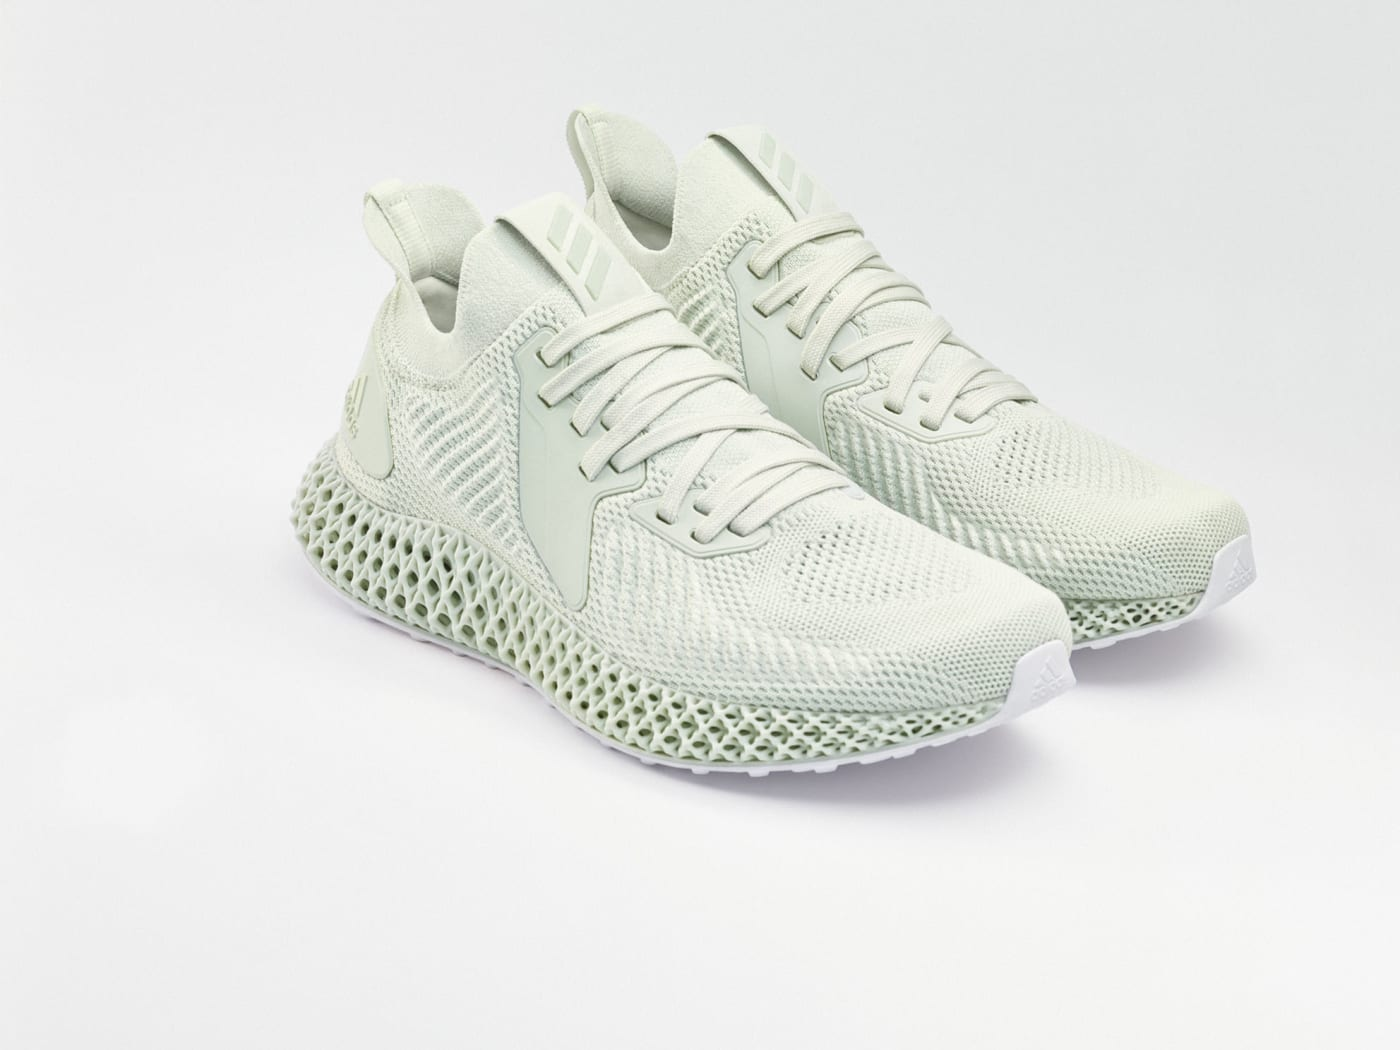 adidas parley alphaedge